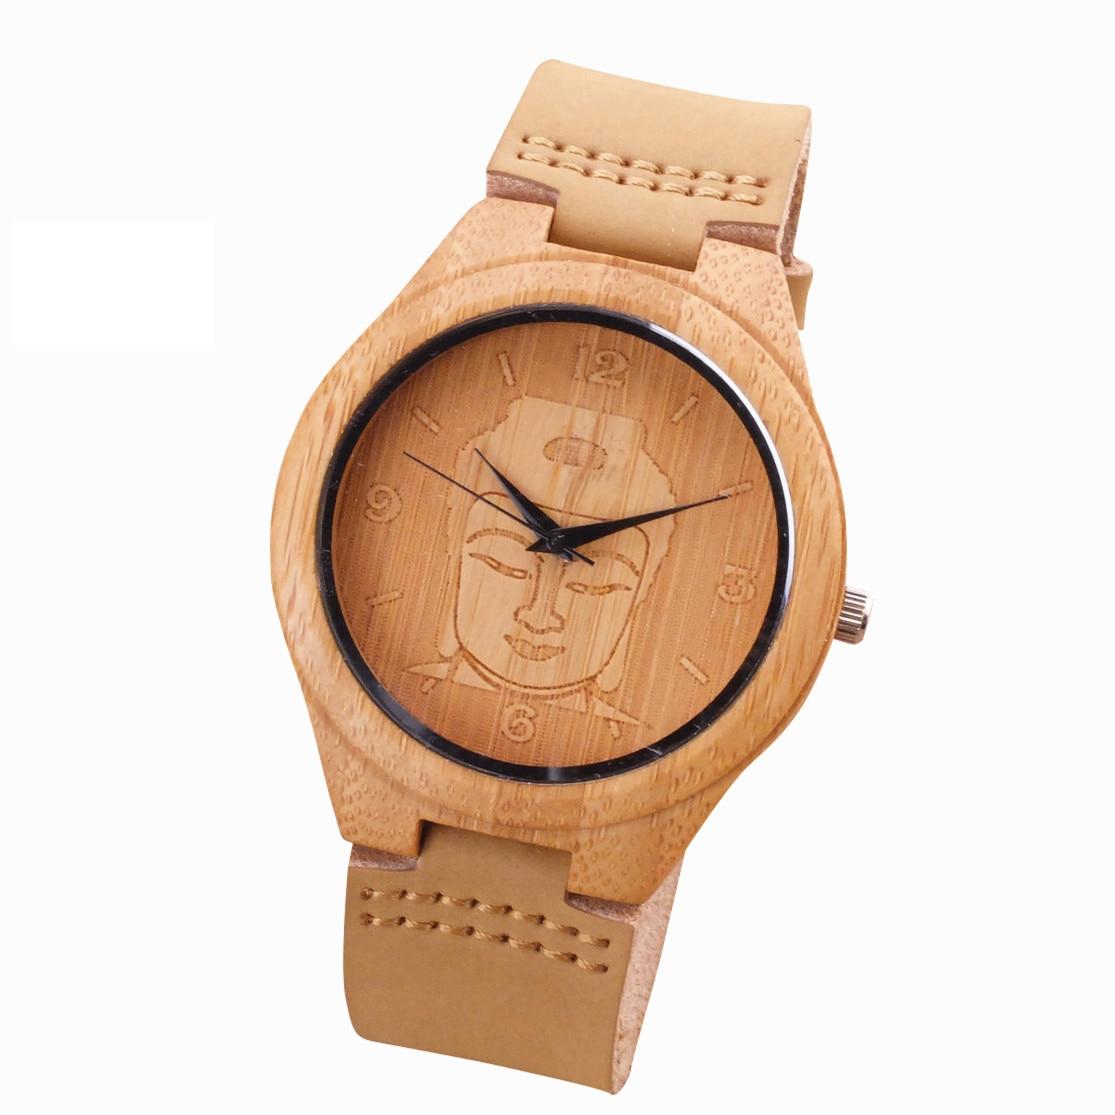 Uhren Honig 2018 Bambus Holz Uhr Minimalistischen Buddha Echtem Leder Band Strap Natur Holz Armreif Armbanduhr Unisex Reloj Hombre Uhr